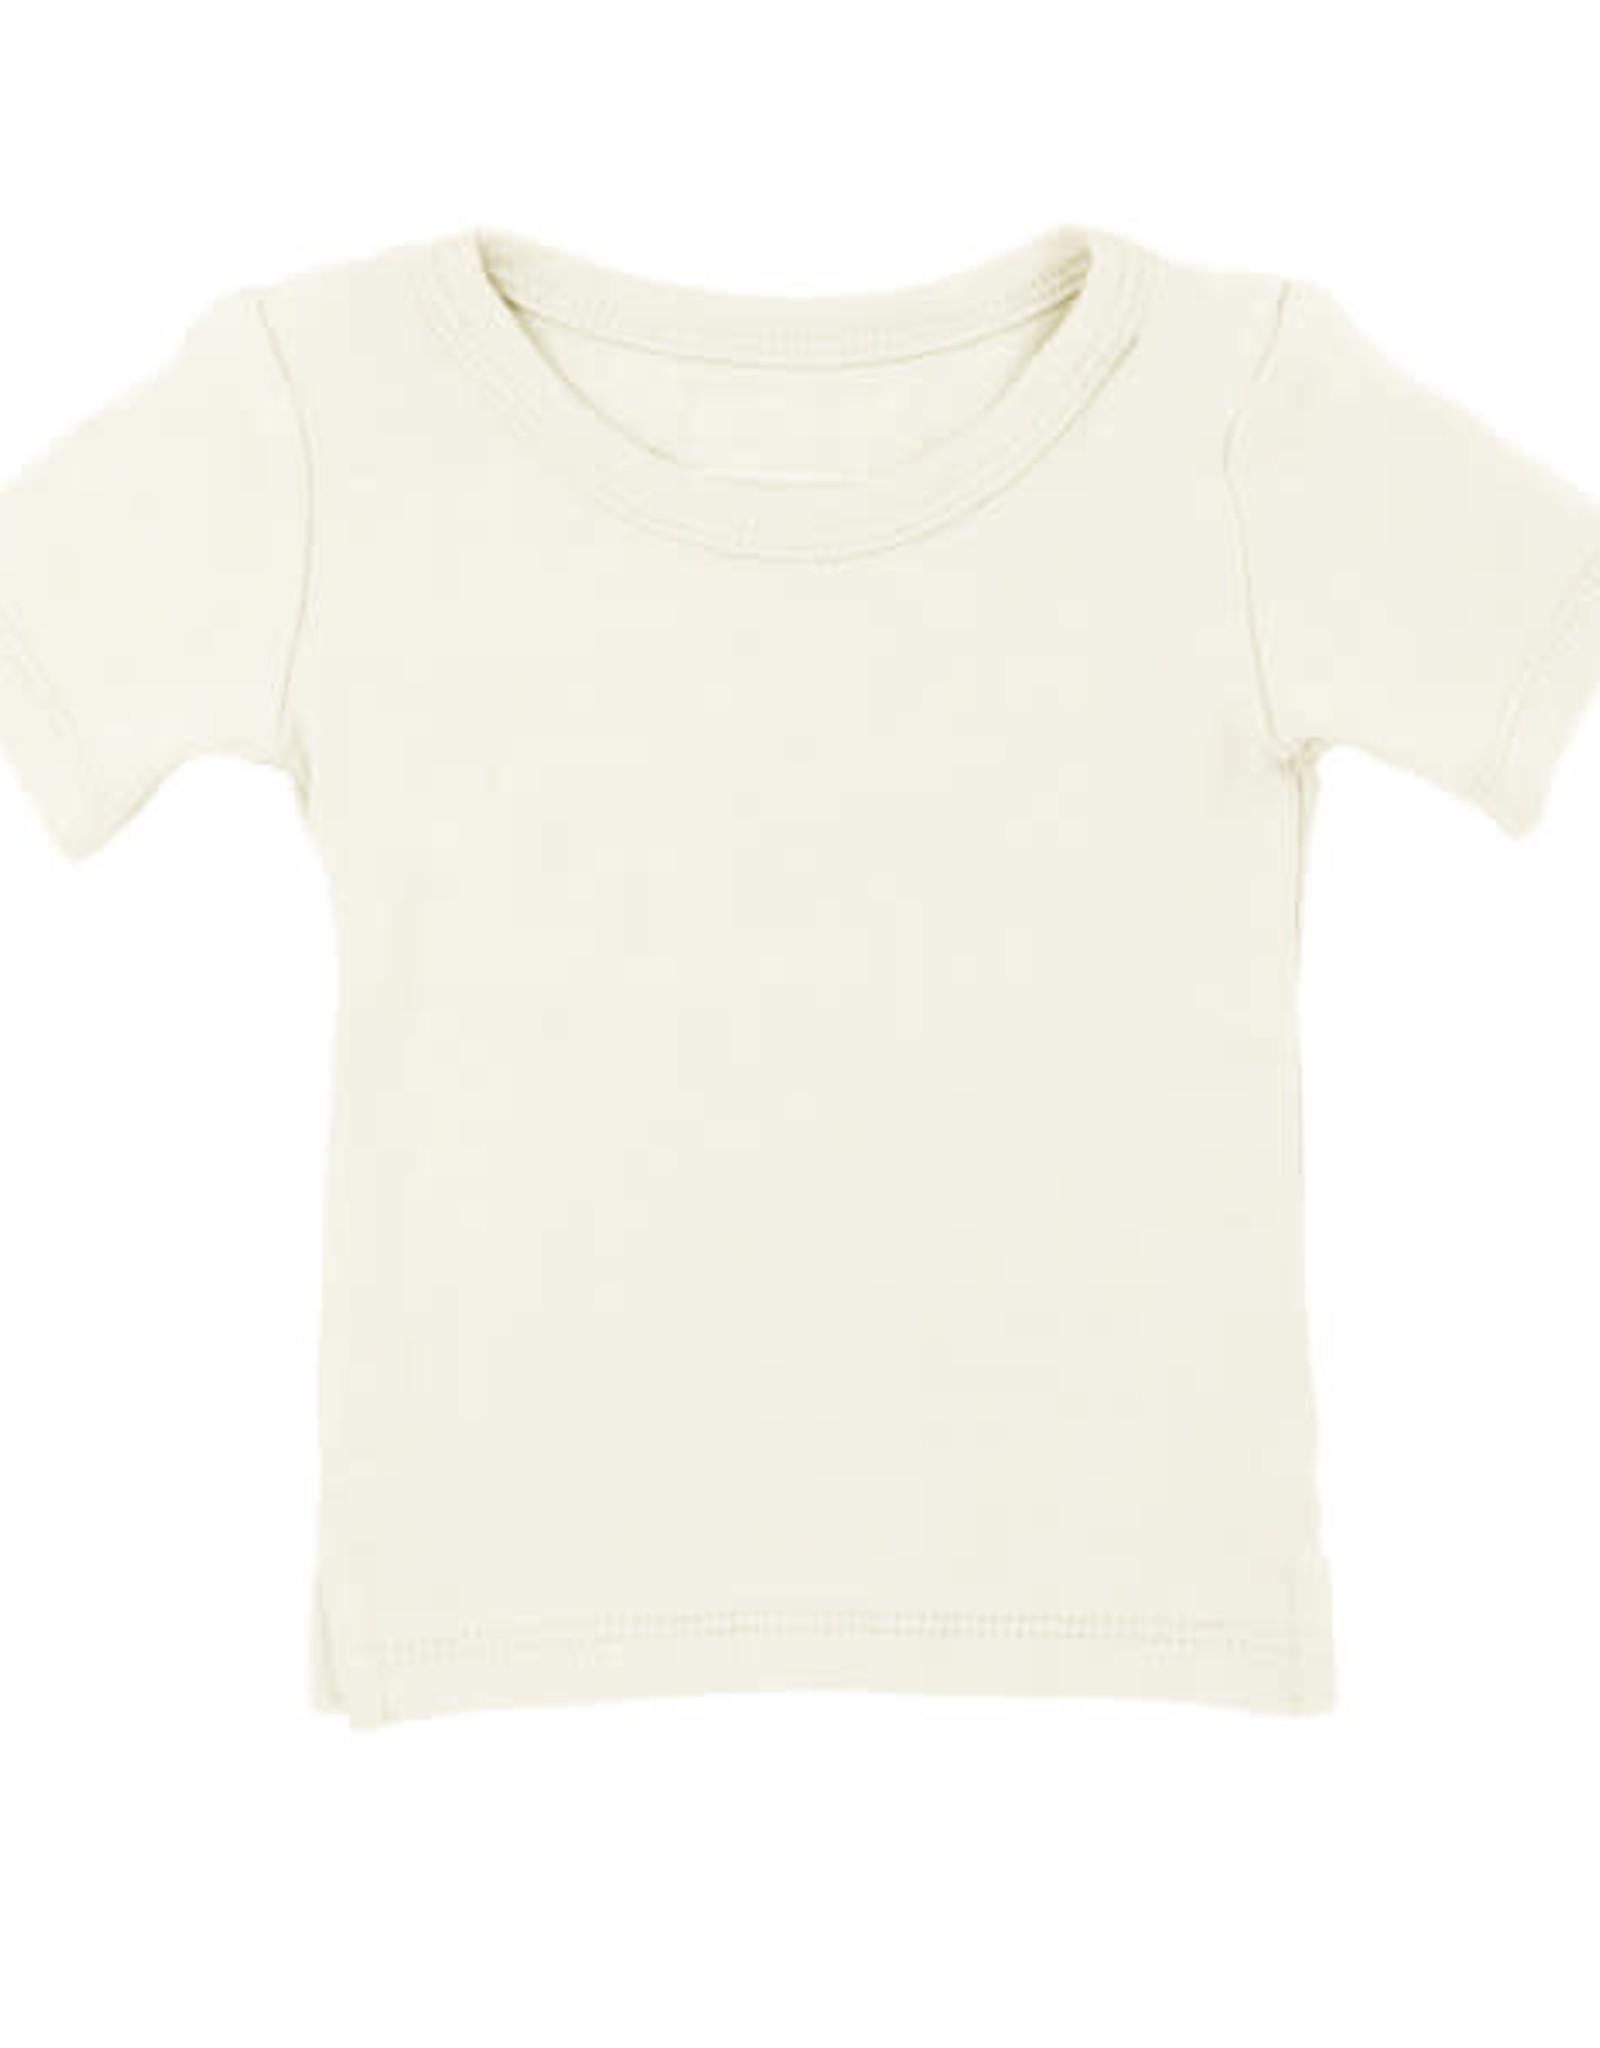 L'oved Baby Kids' Short Sleeve Shirt Beige